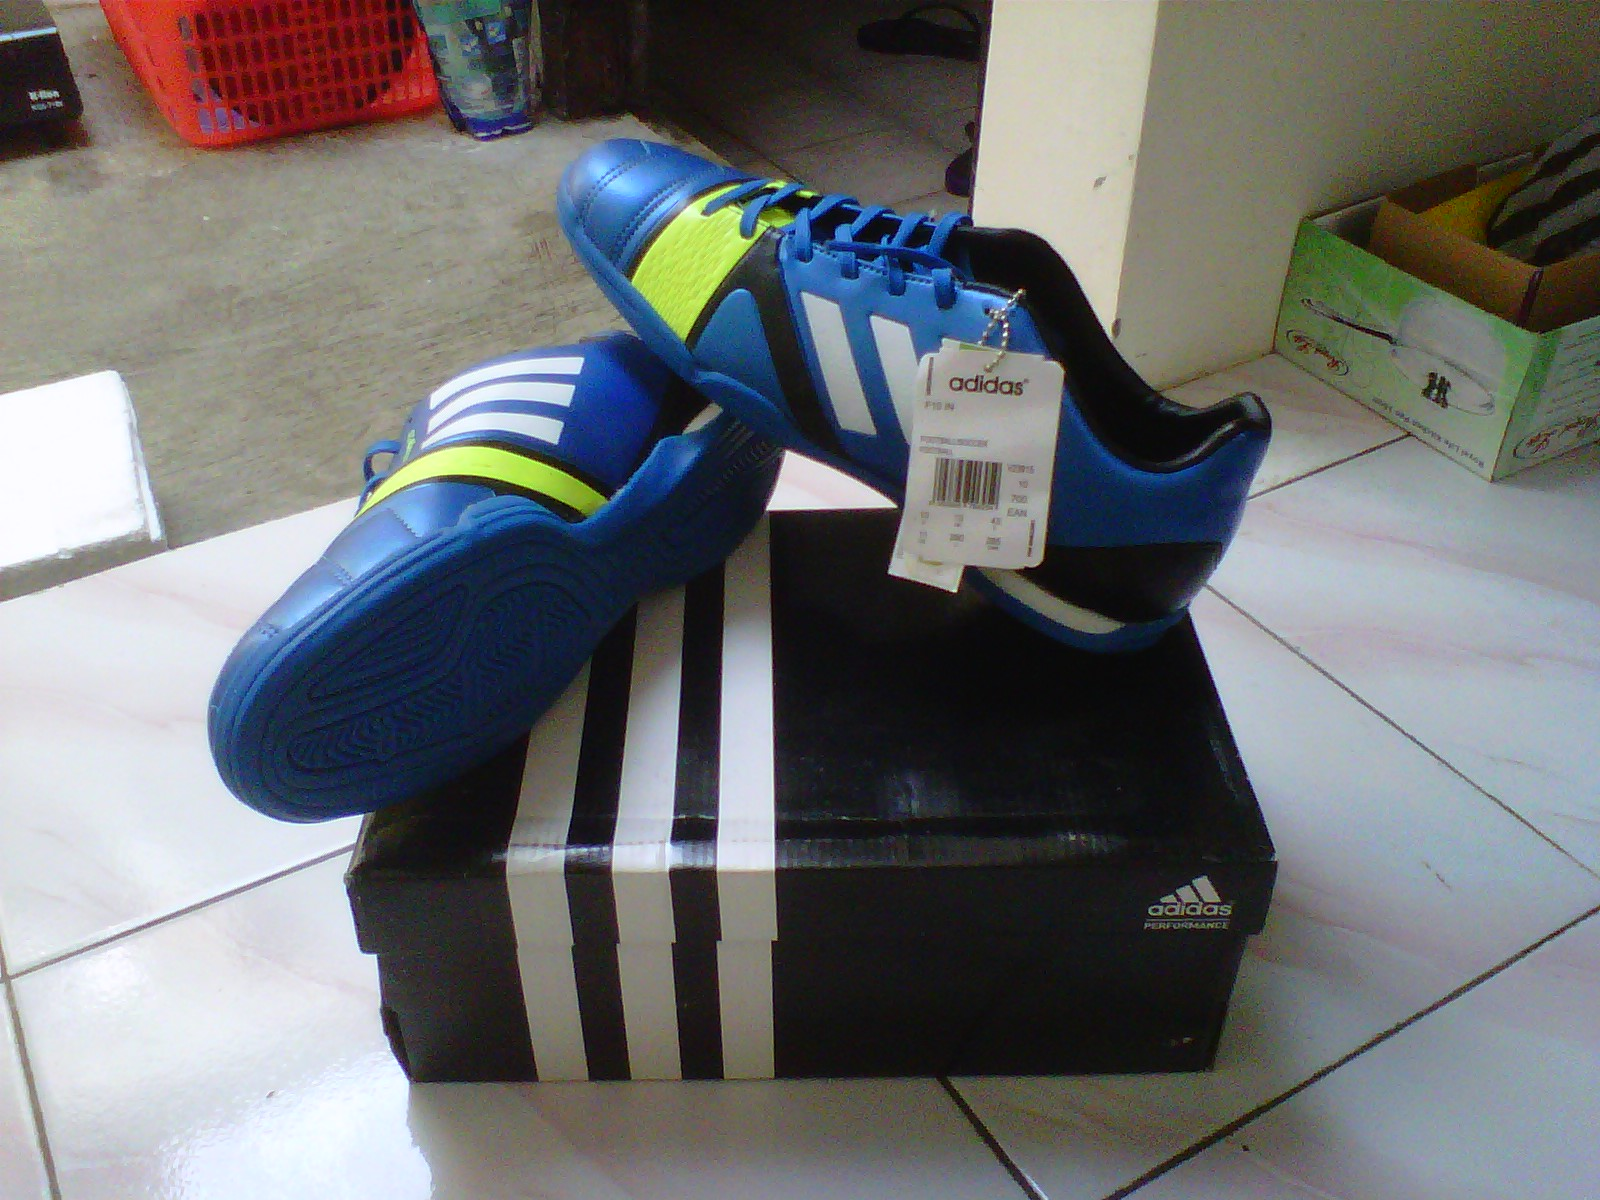 Daftar Harga Sepatu Futsal Adidas 9715780398